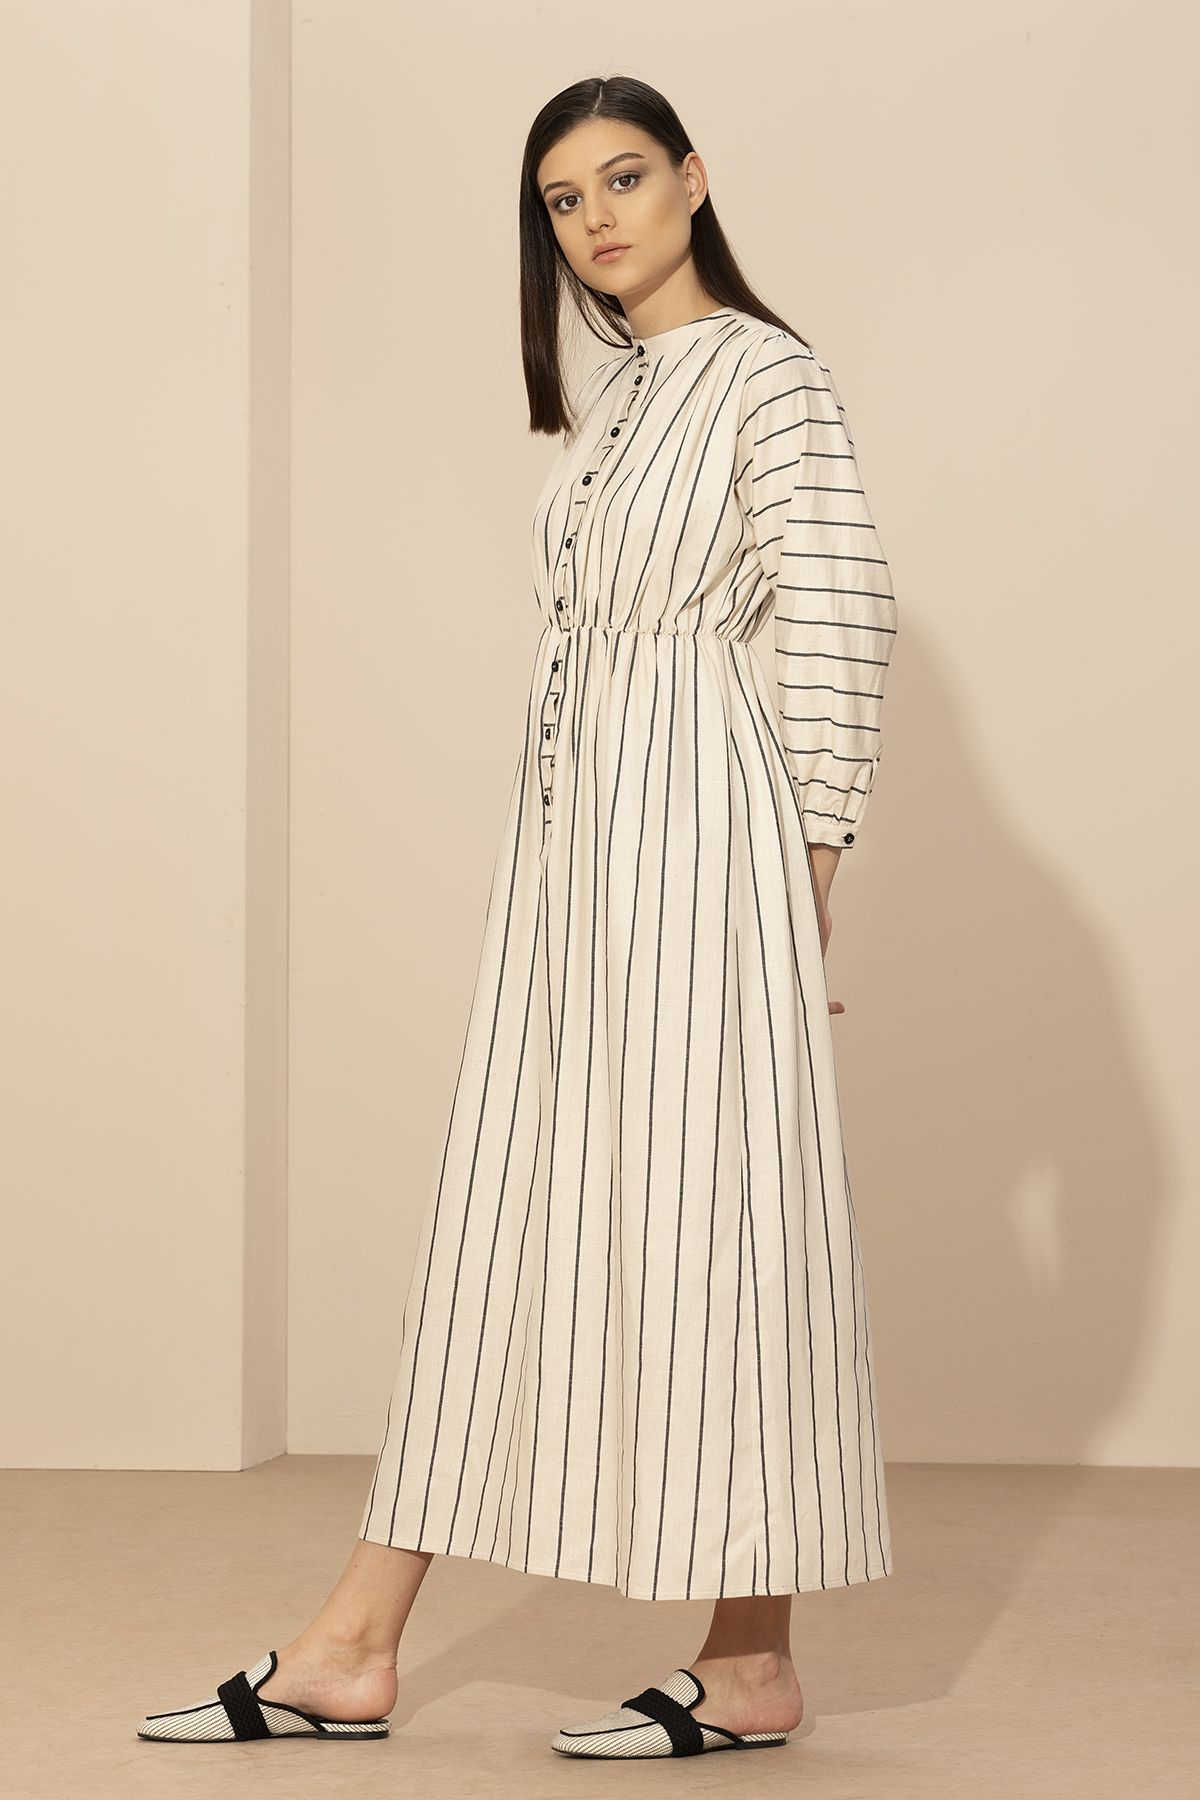 Koton Ekru Siyah Cizgili Elbise 2090 Kuaybegider Com Cizgili Elbise Elbise Elbise Dugun